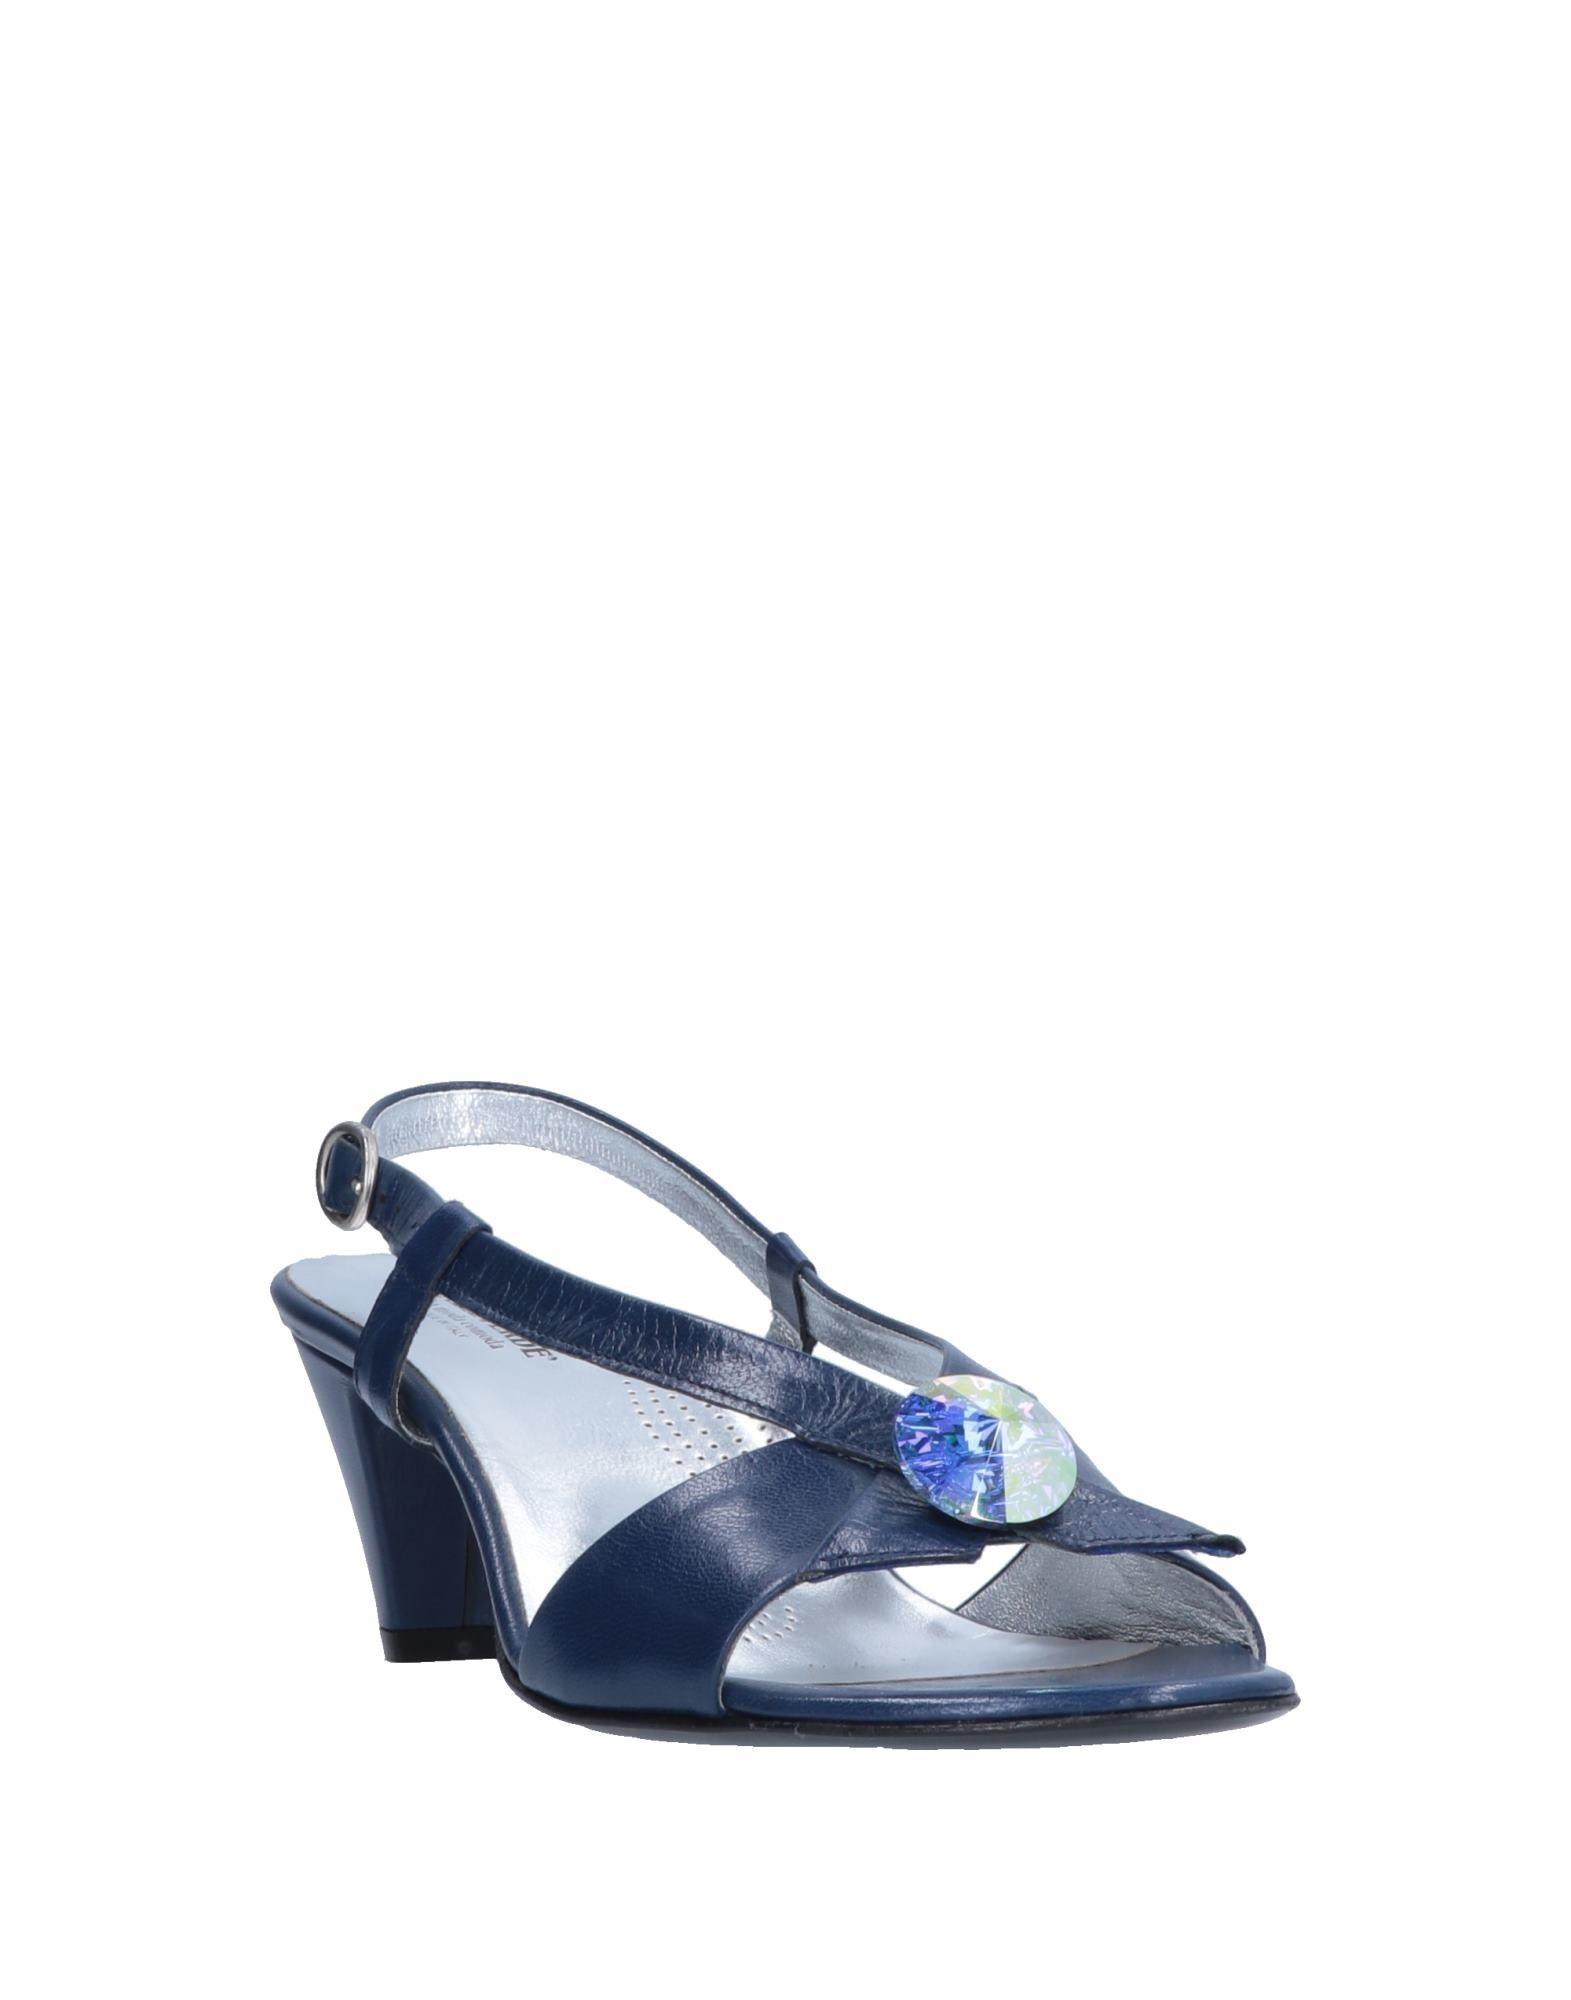 valleverde sandales en - femmes valleverde 11547515ek sandales en sandales ligne le royaume - uni - b17283